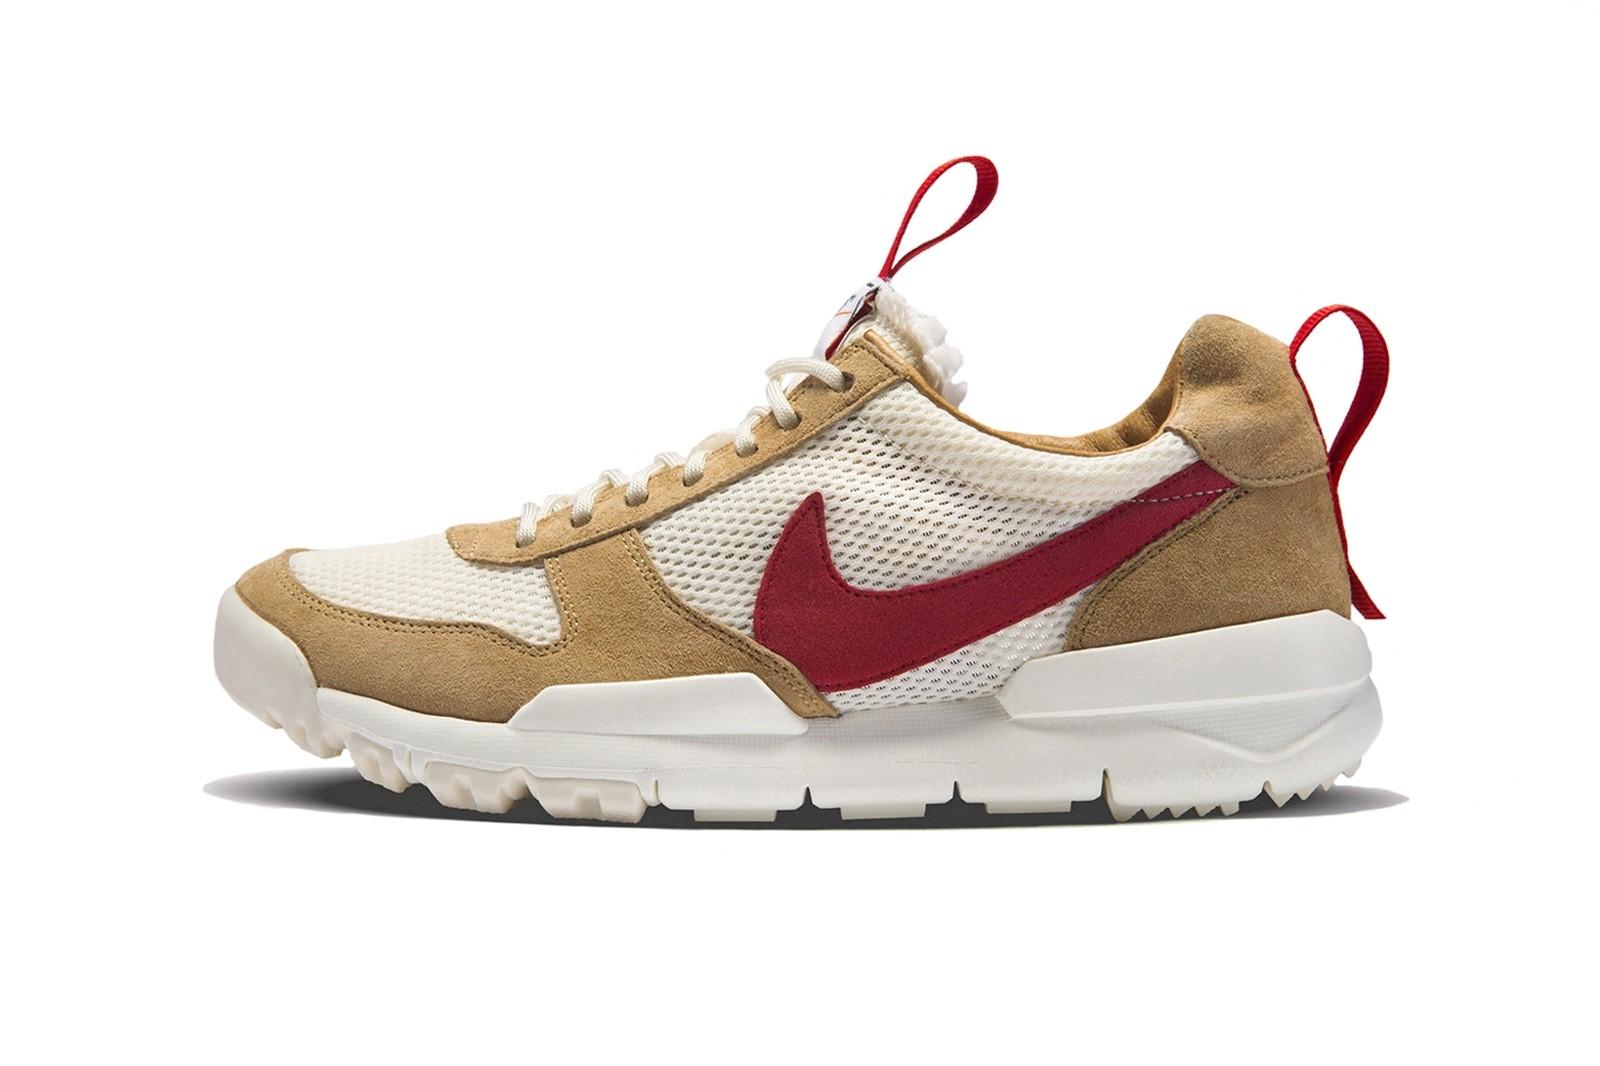 giay the thao tuan 1 thang 6.2017 - Tom Sachs x Nike Mars Yard 2.0 - elle man